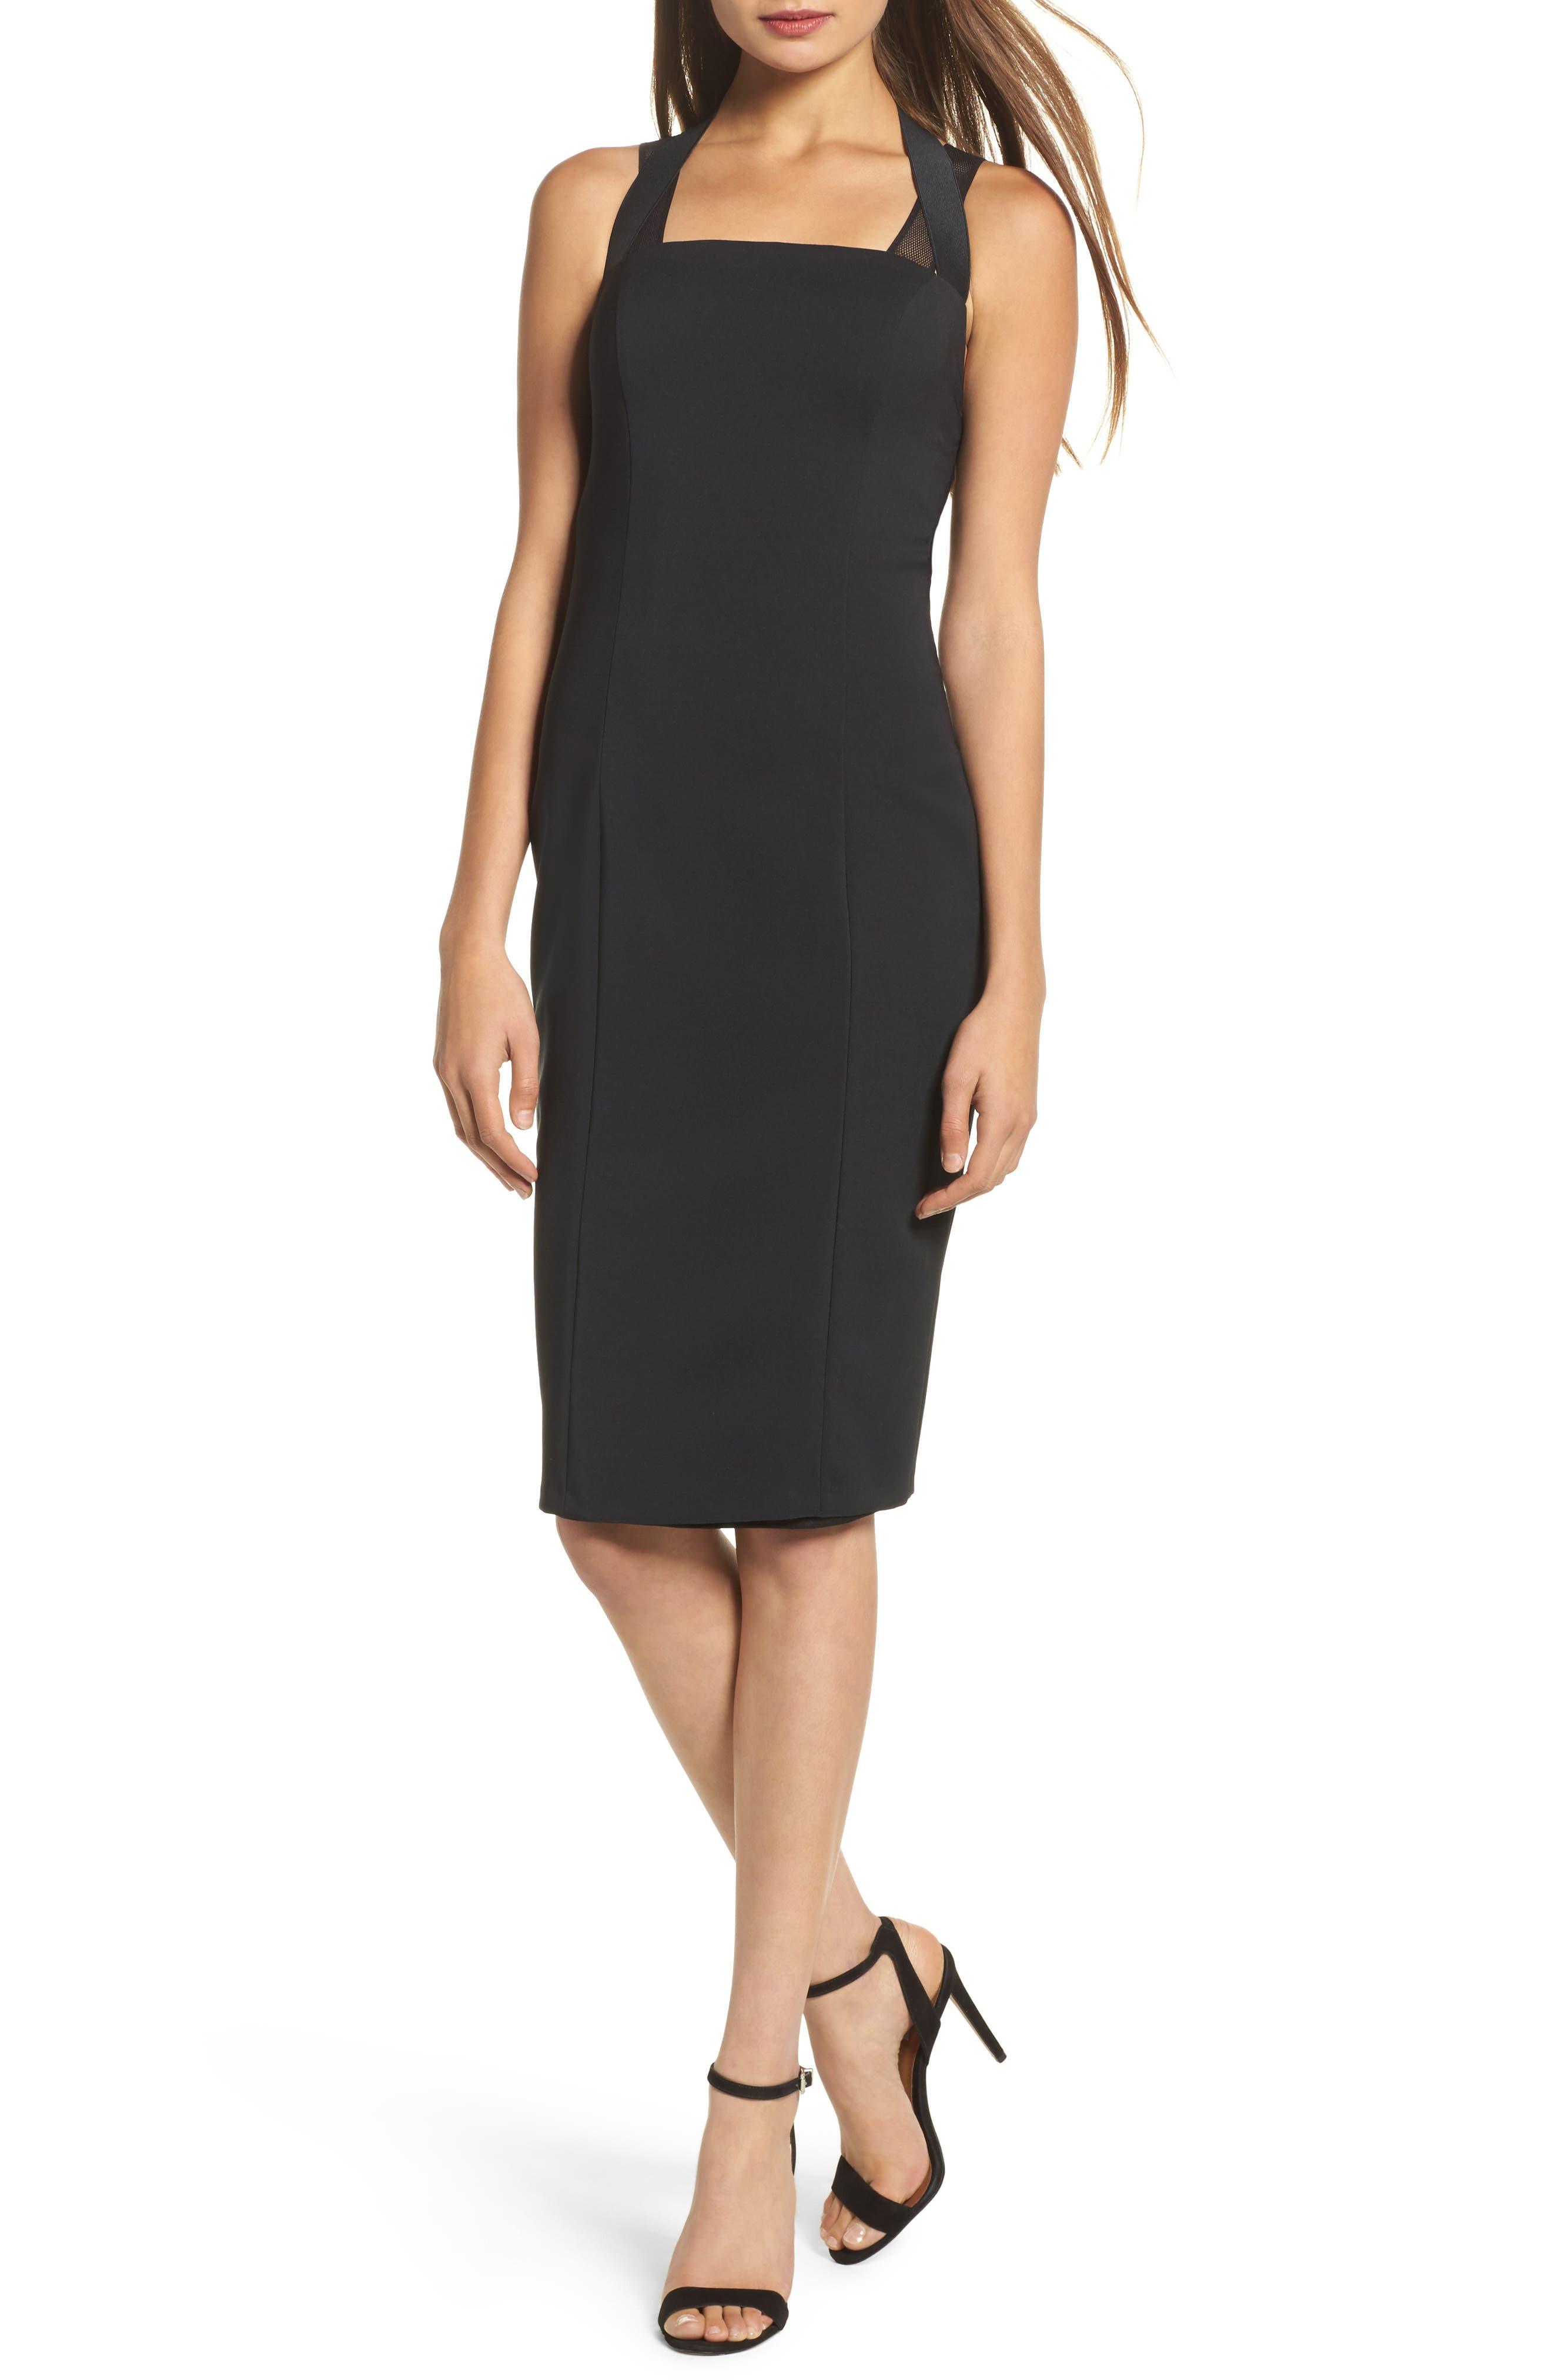 Kendra Elastic Strap Low Back Sheath Dress,                         Main,                         color,